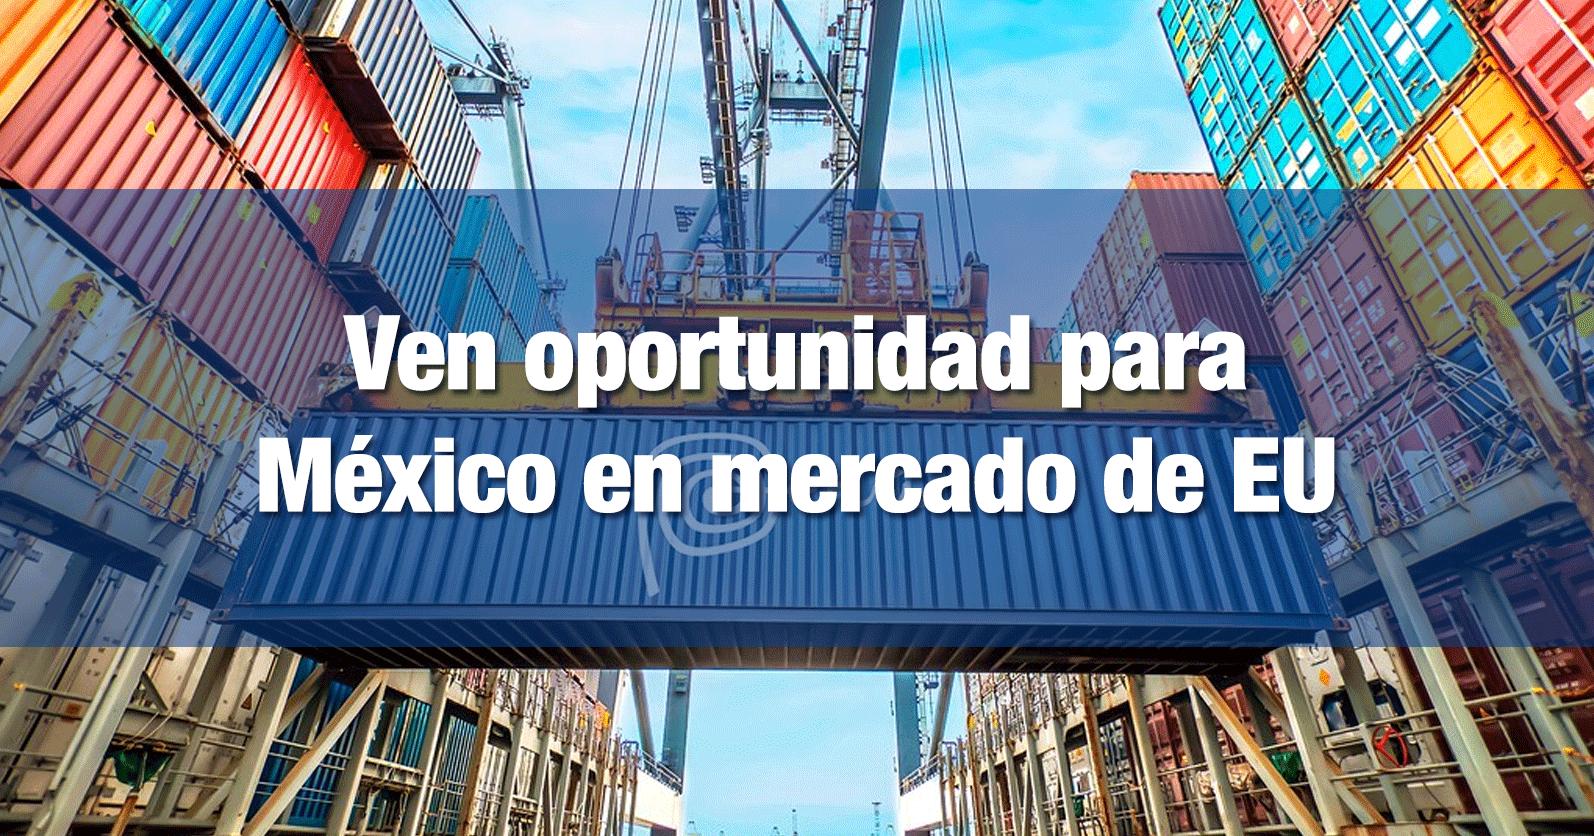 Ven oportunidad para México en mercado de EU